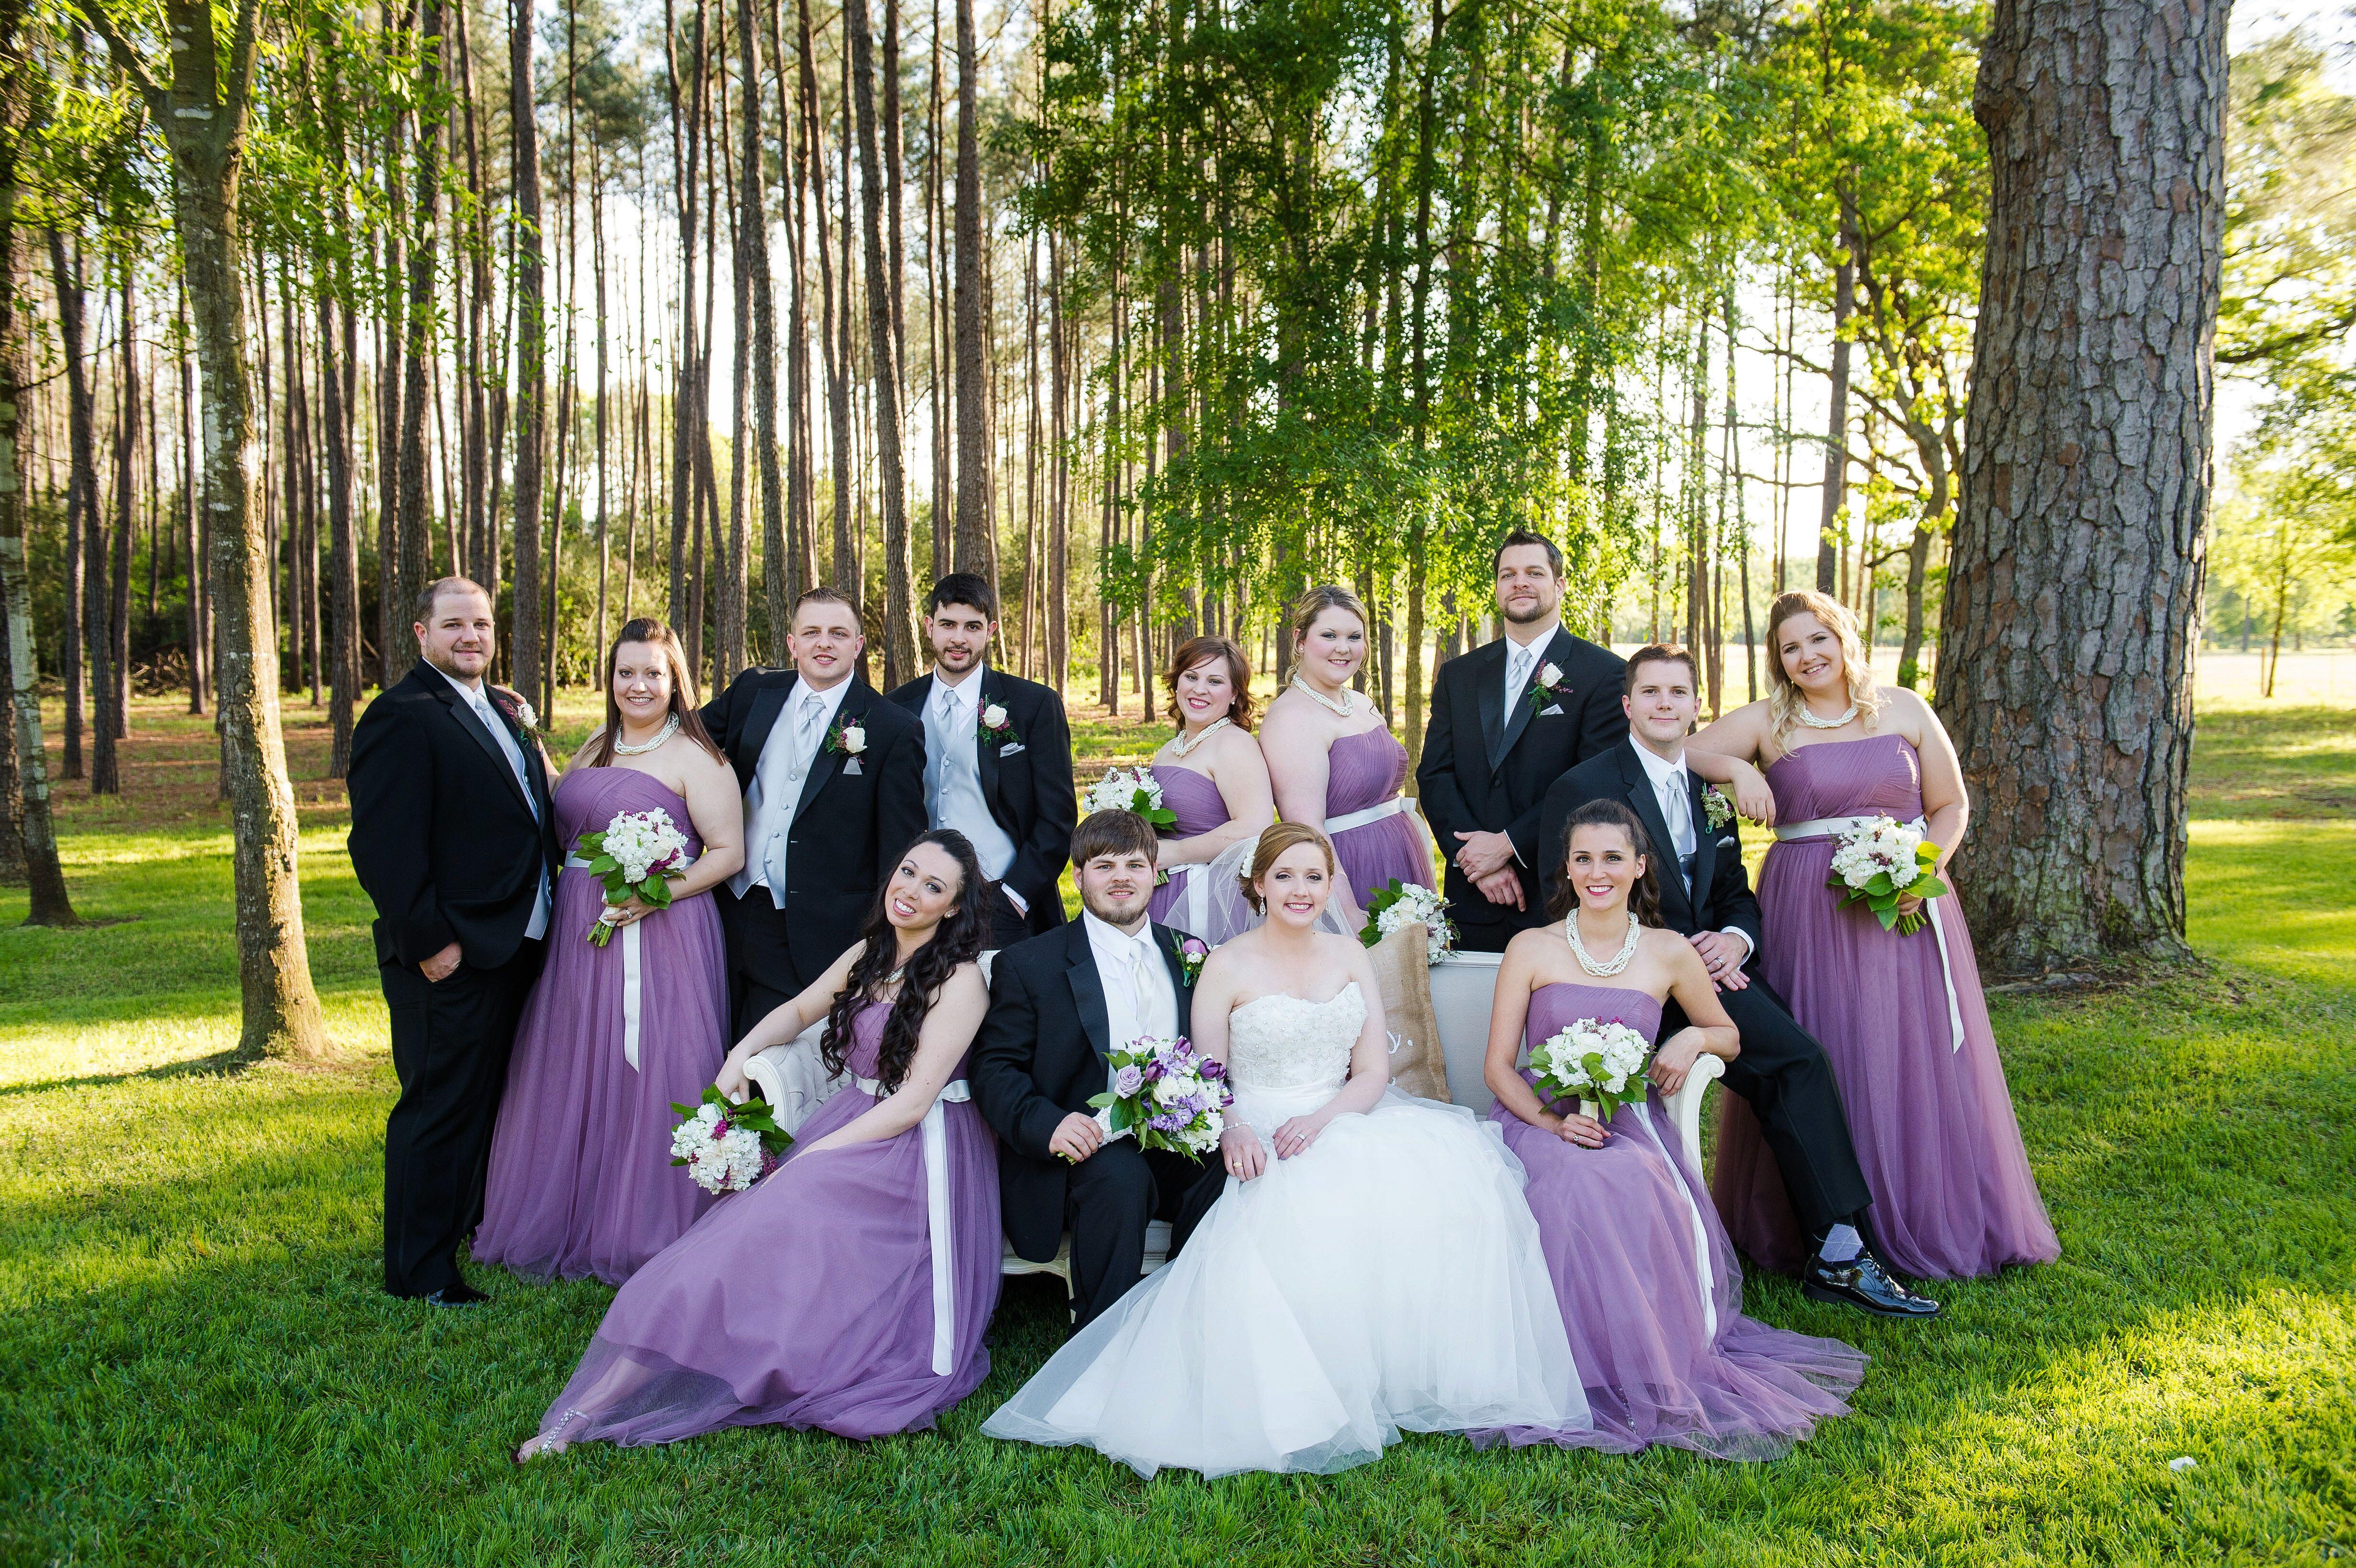 lilac bridesmaid and groom - HD4928×3280